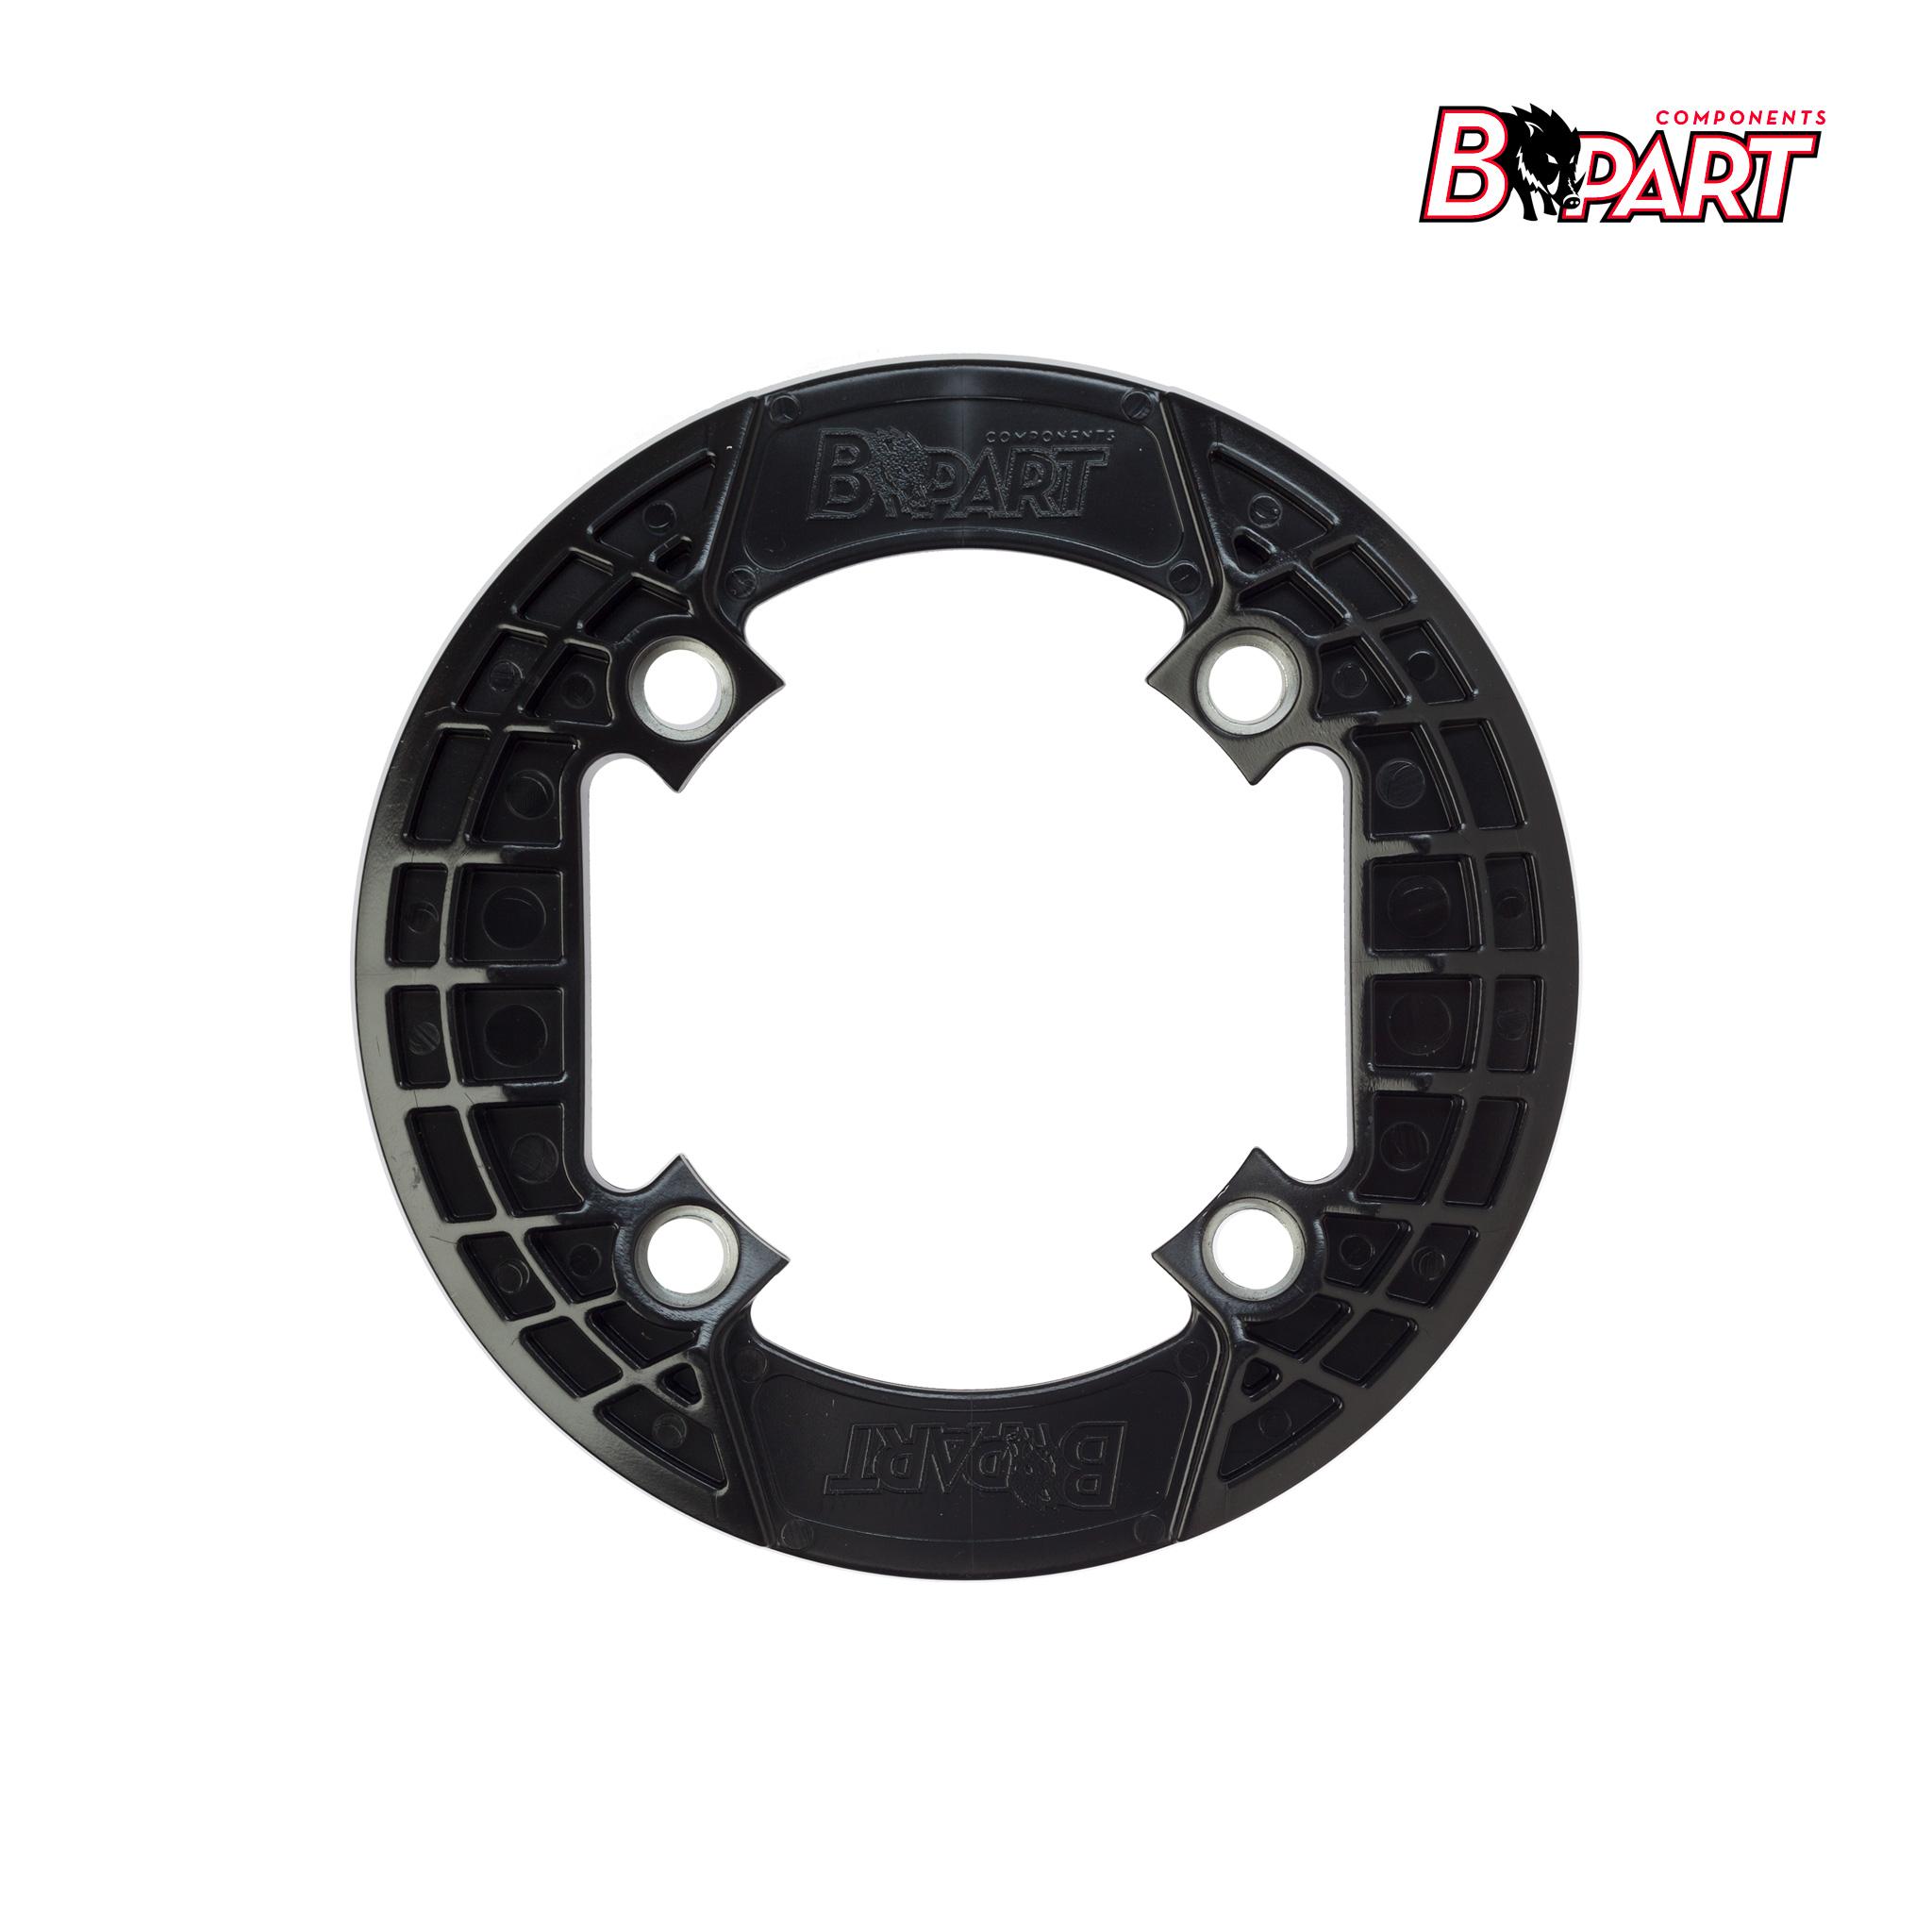 Bpart Components cubreplatos negro